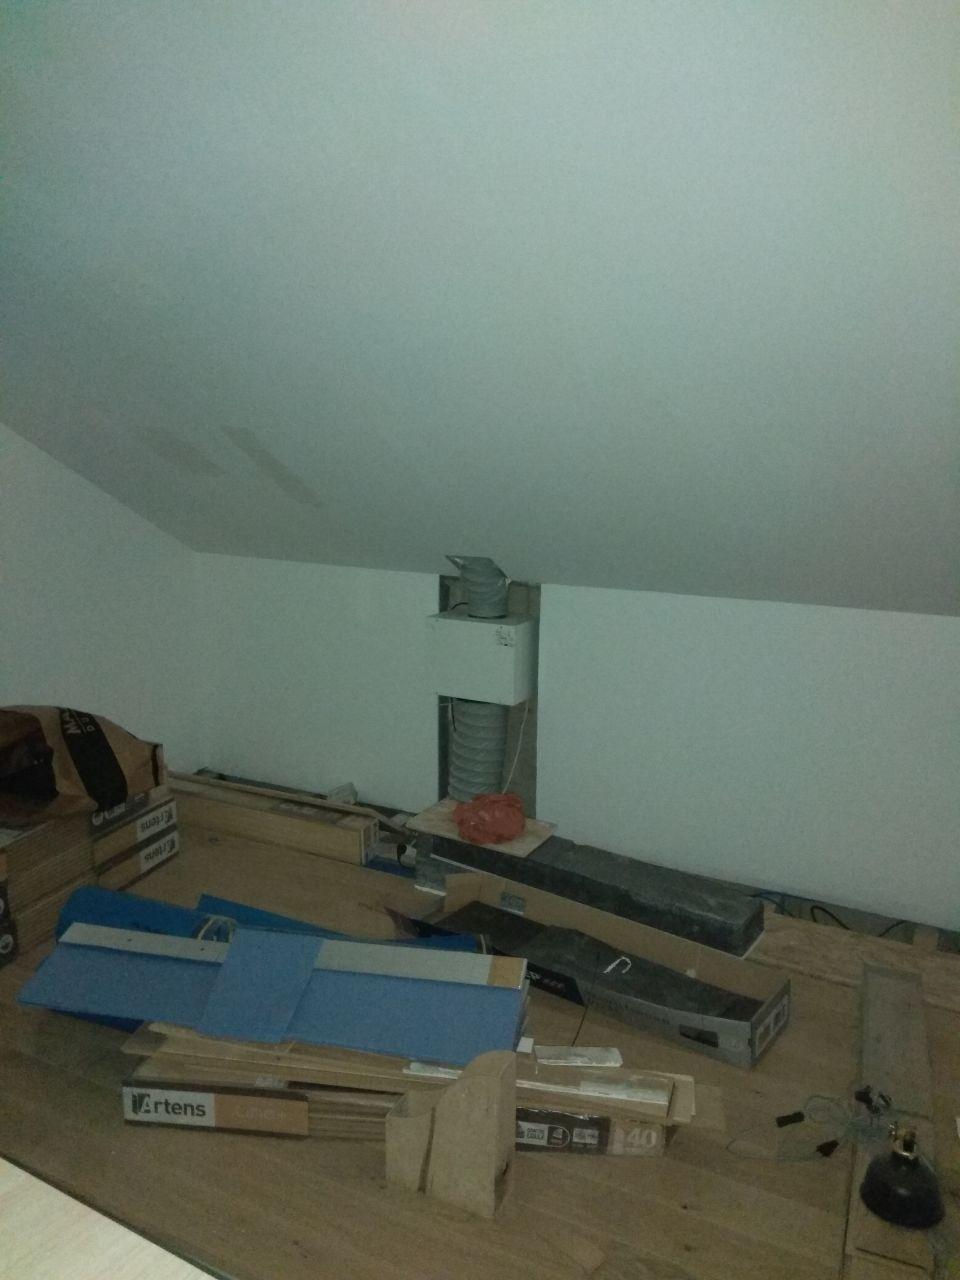 comment isoler une chambre du bruit isoler du bruit leroy merlin comment isoler une porte du. Black Bedroom Furniture Sets. Home Design Ideas